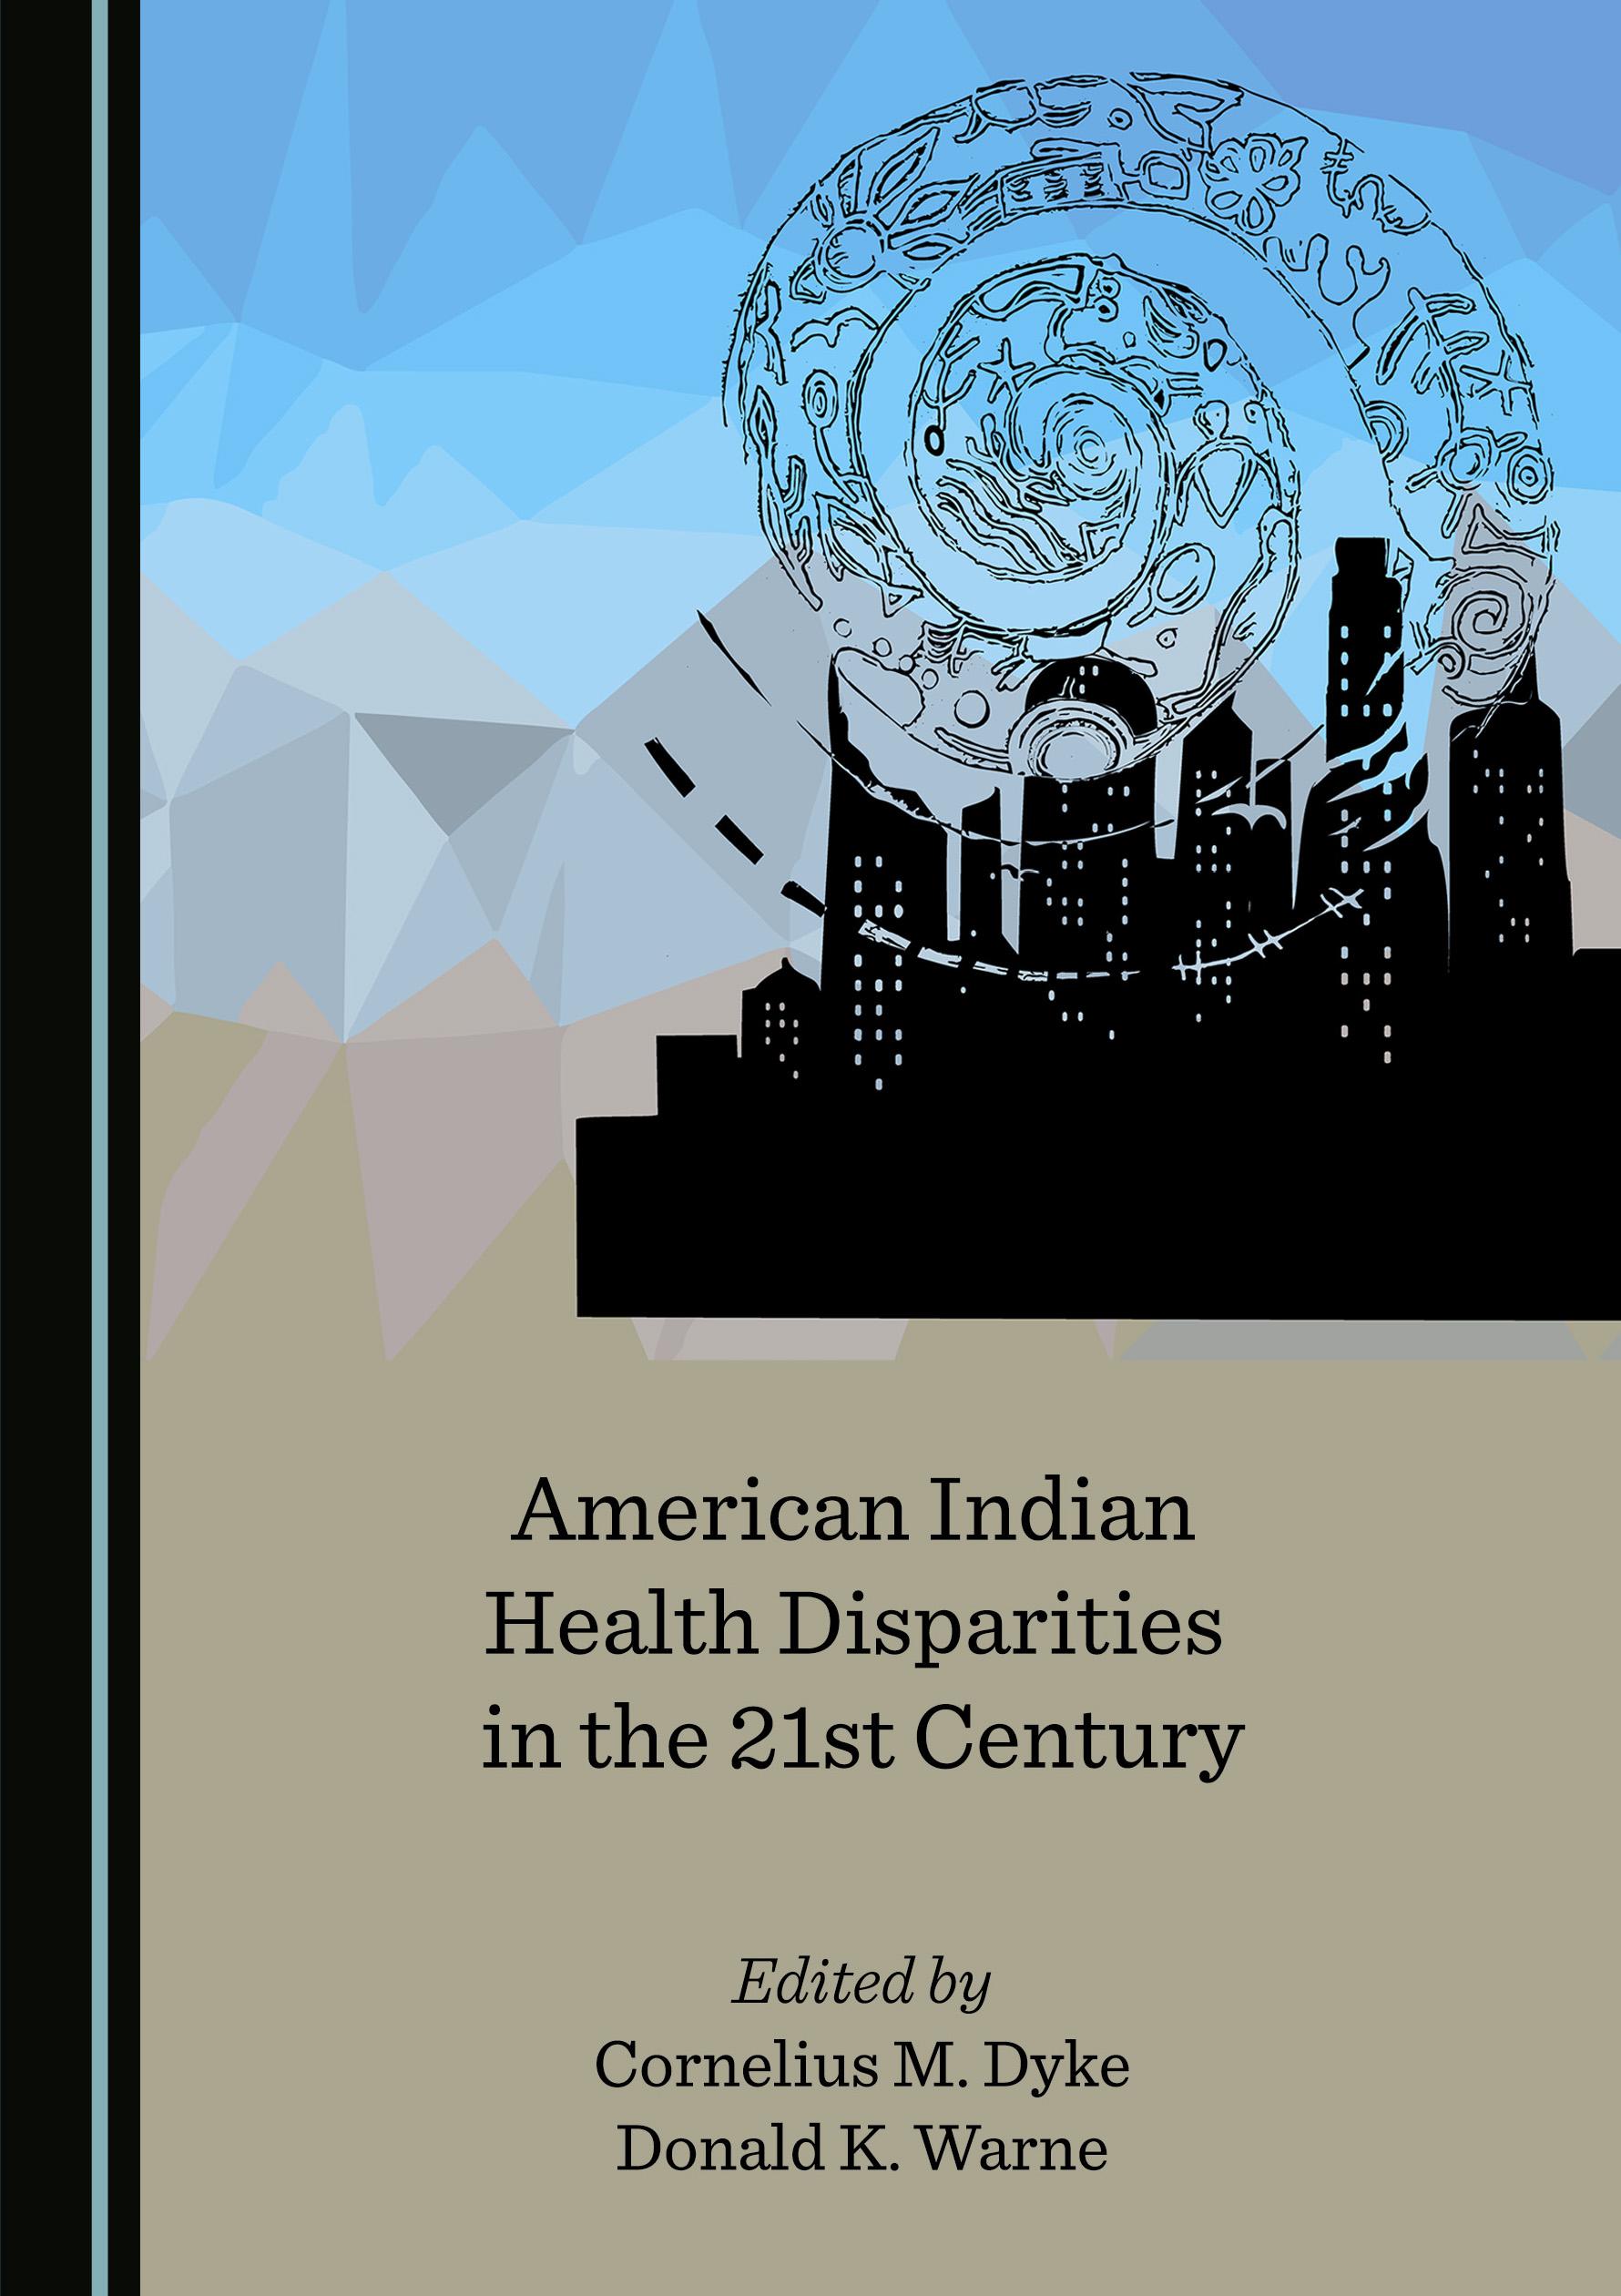 American Indian Health Disparities in the 21st Century